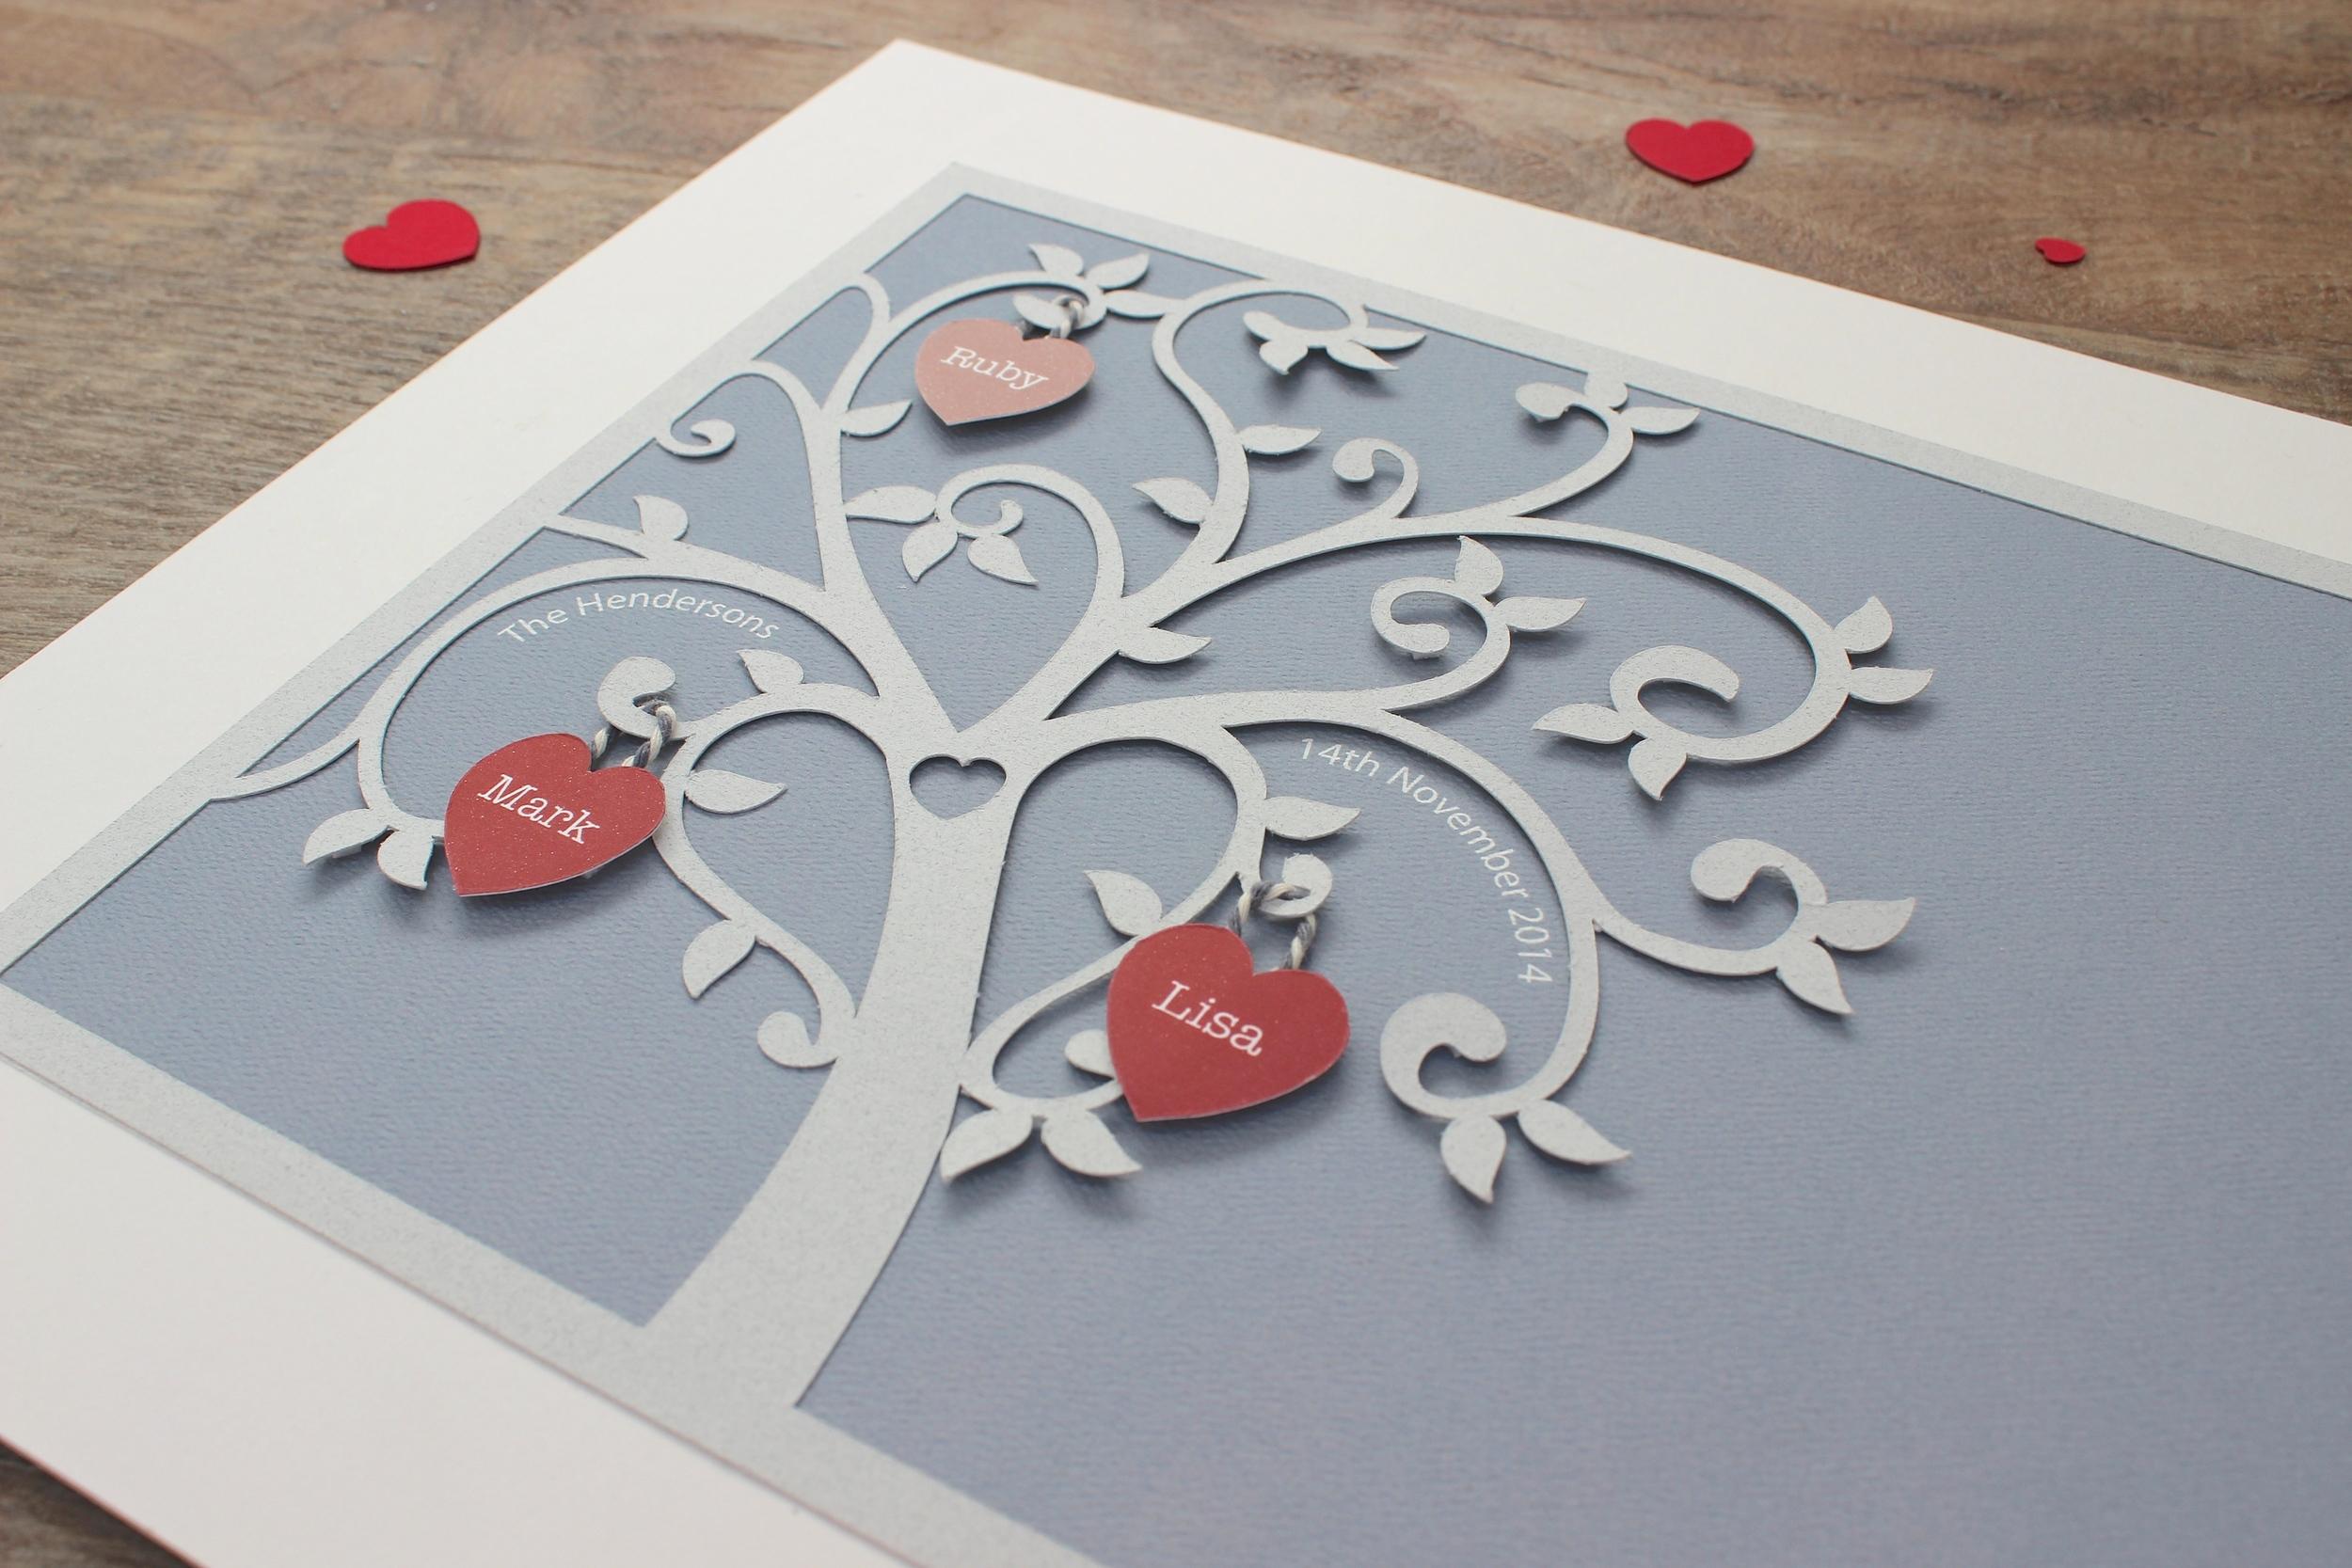 1st anniversary gift family tree paper cut wall art. 20 x 25cm